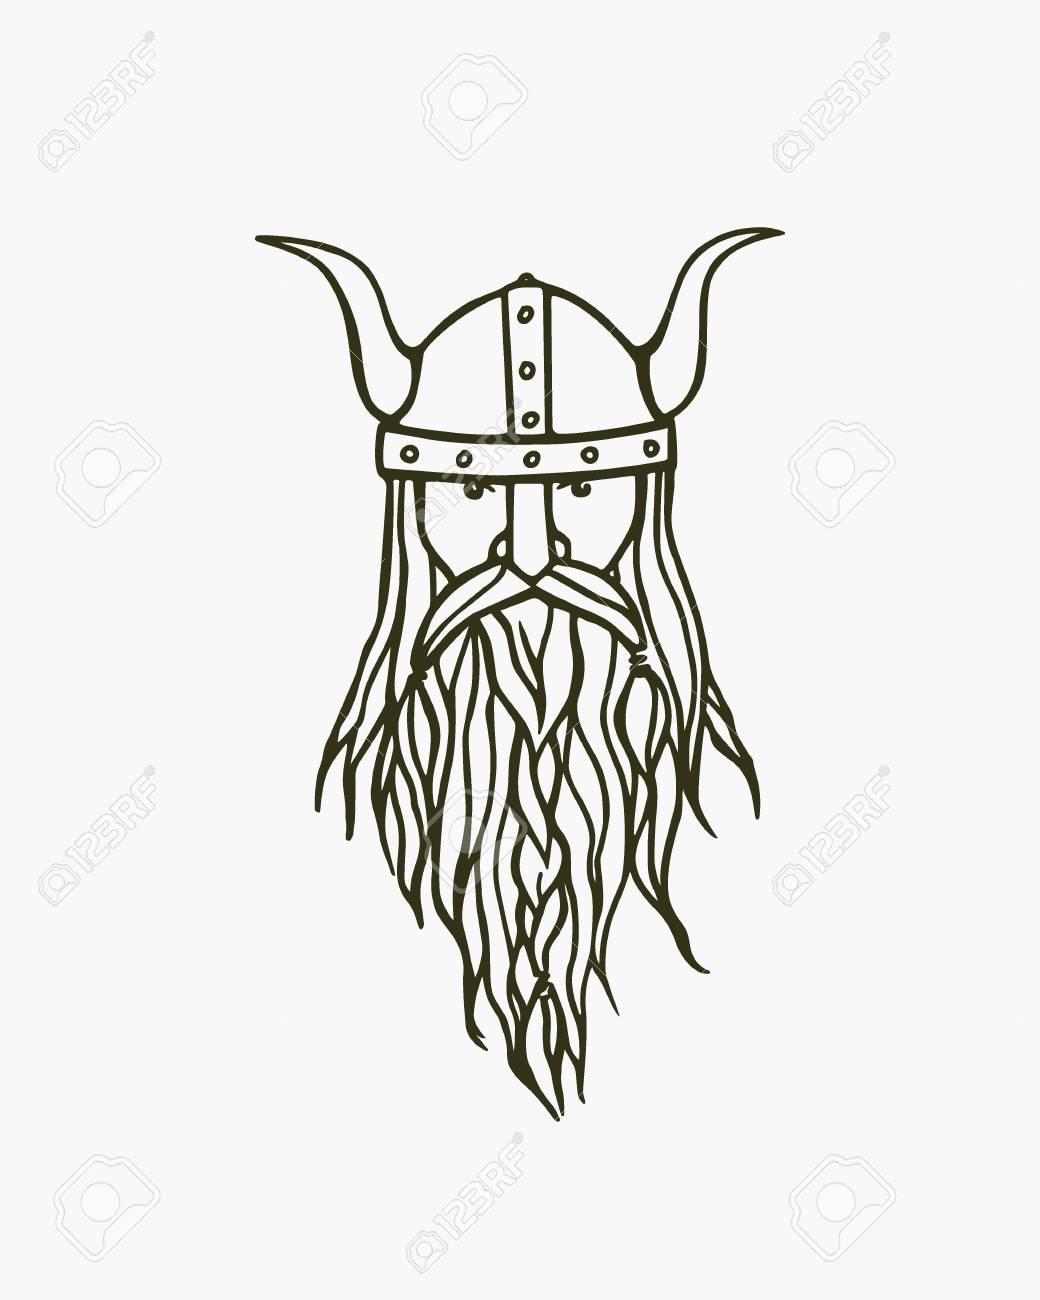 1040x1300 Hand Drawn Head Of Bearded Viking With Helmet On. Vector